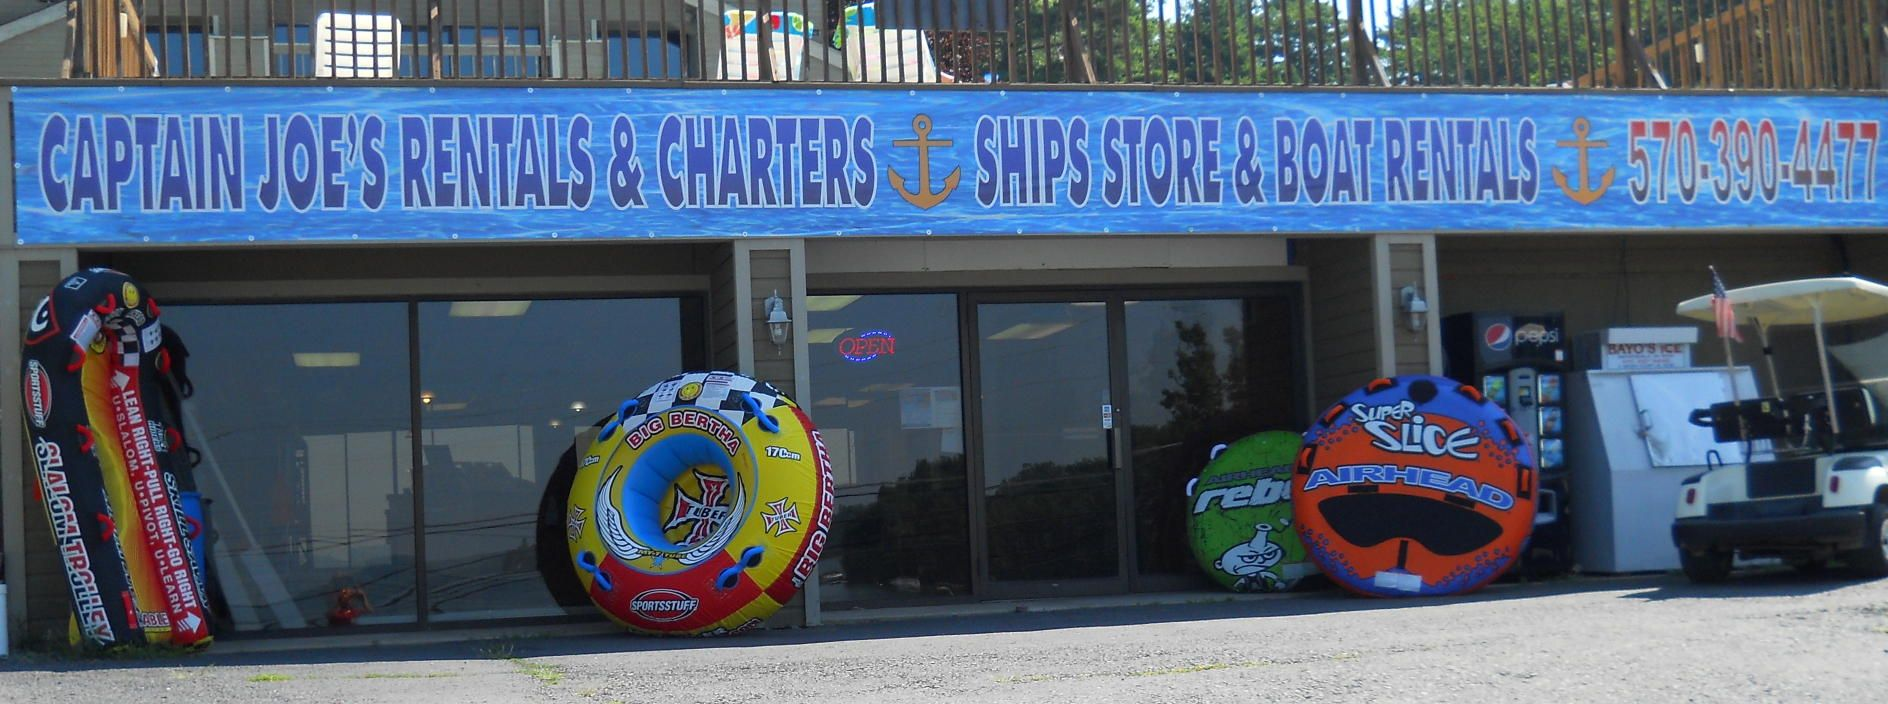 Captain joes sales service inc rentals charters